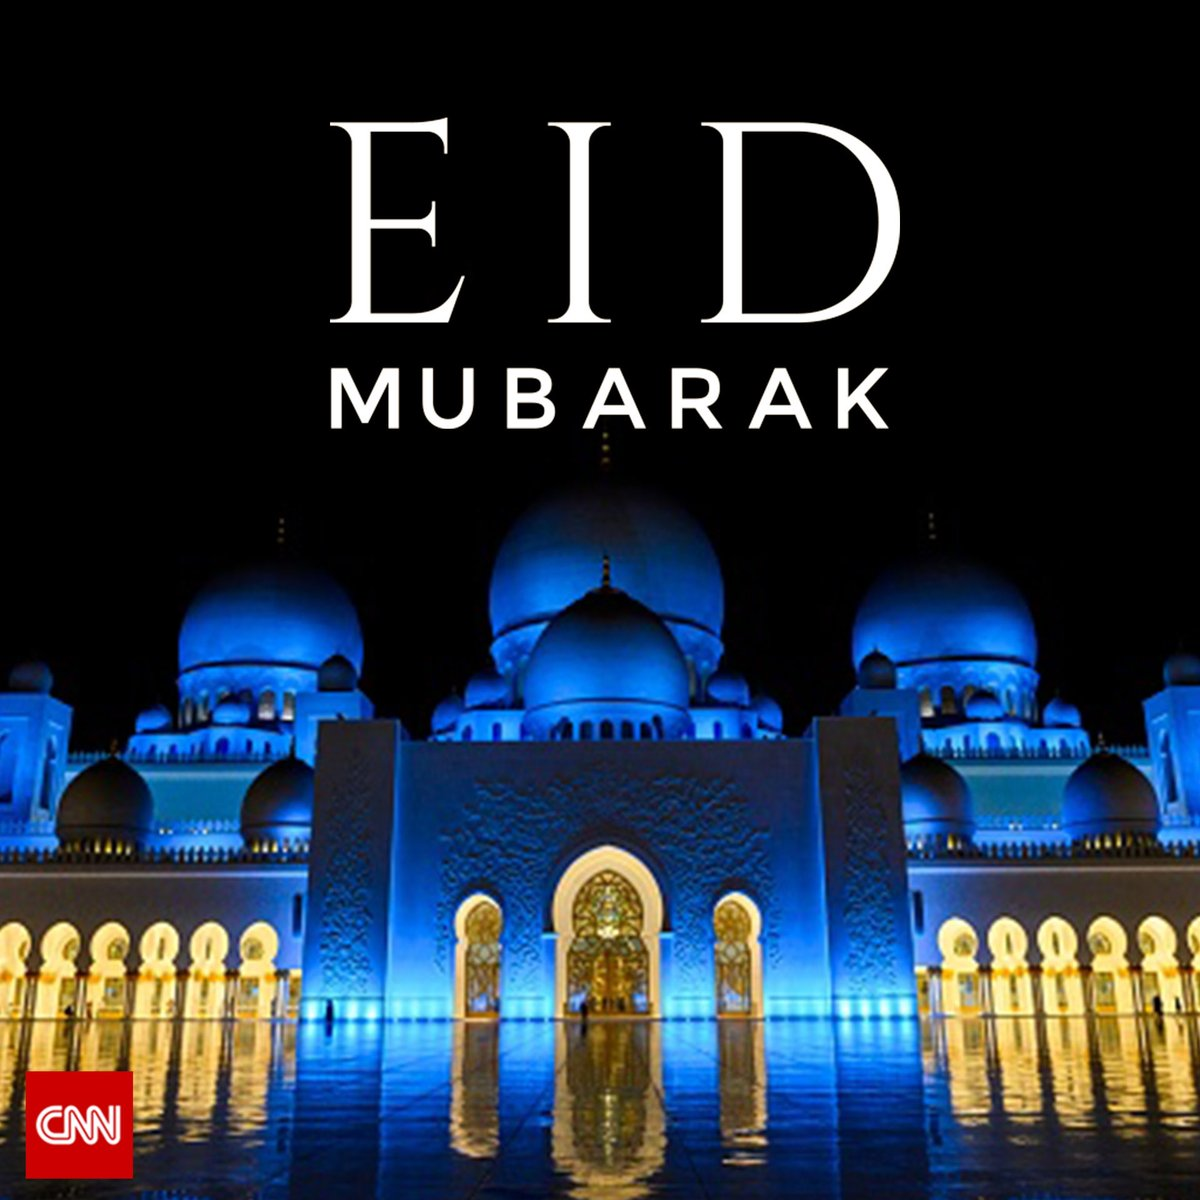 #EidMubarak to all those celebrating #EidAlFitr around the world. https://t.co/Mi3UjtTlnw